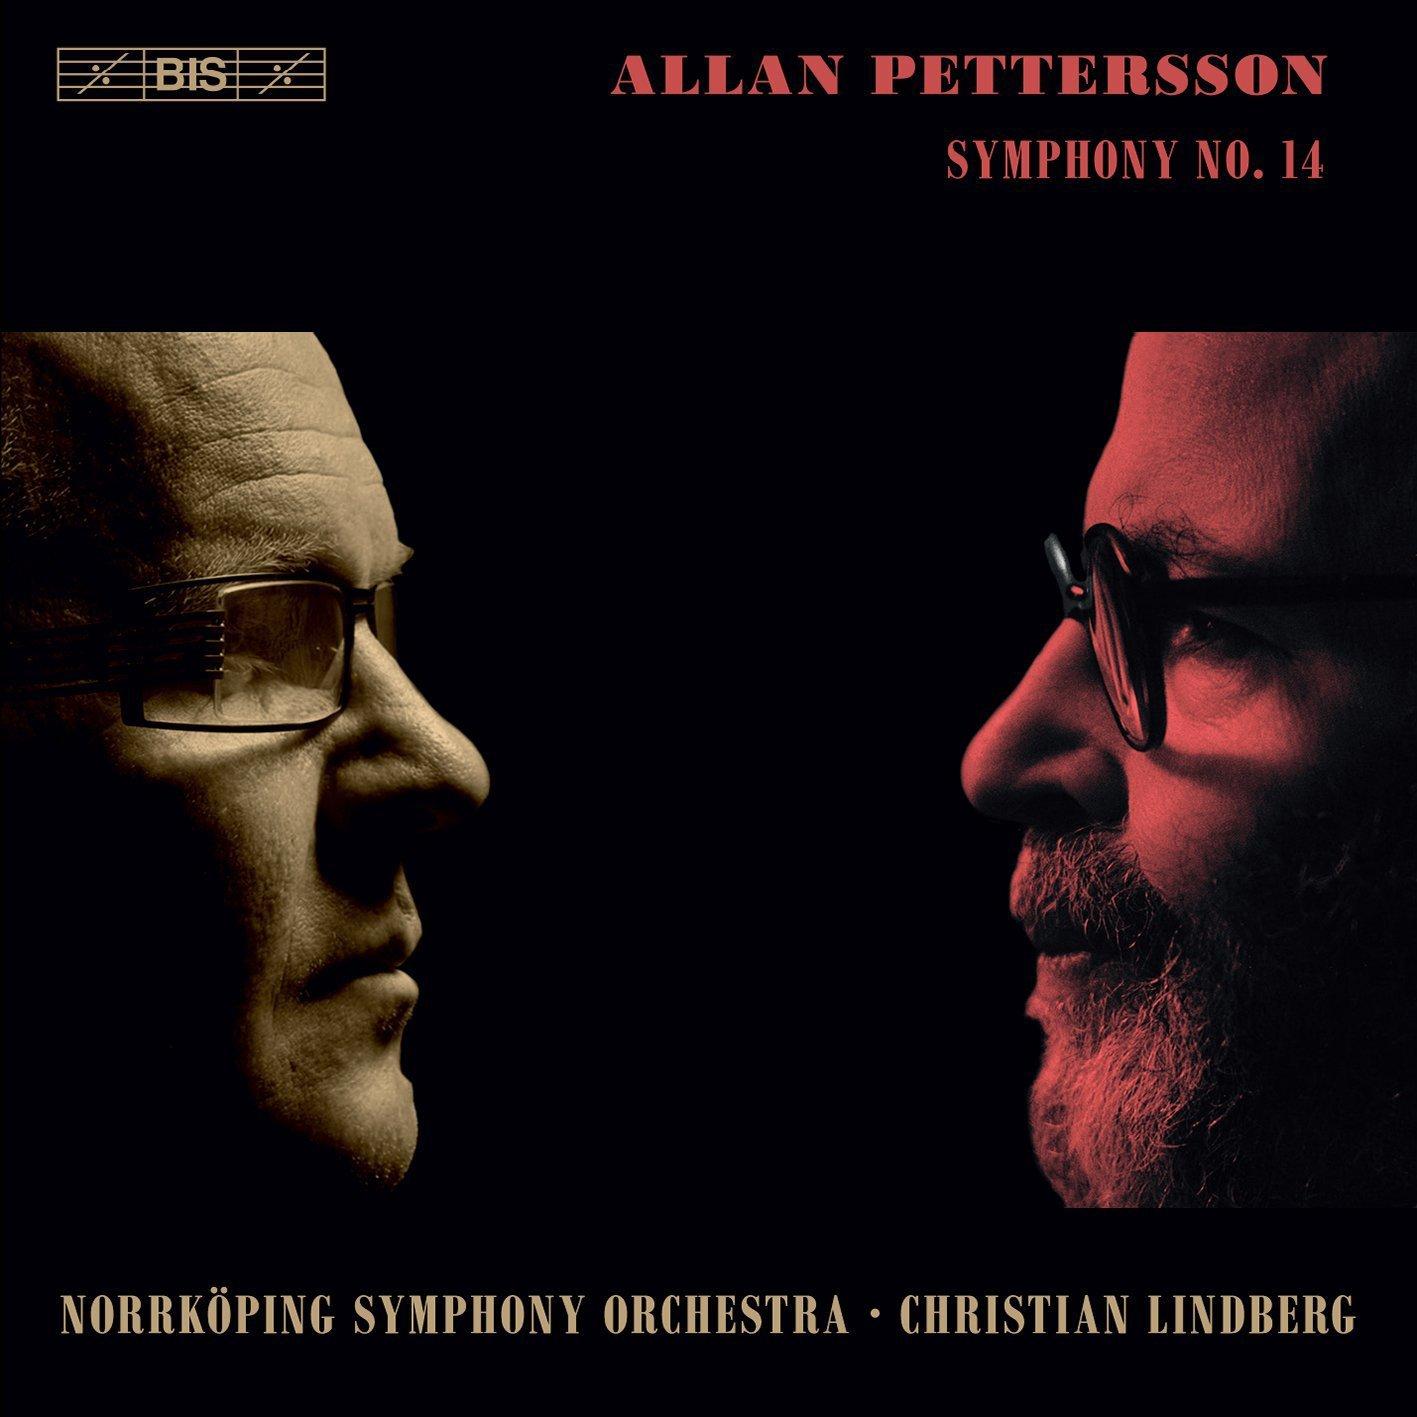 SACD : PETTERSSON,A. - Allan Pettersson: Symphony No. 14 [1 Hybrid Sacd + 1dvd] (2PC)